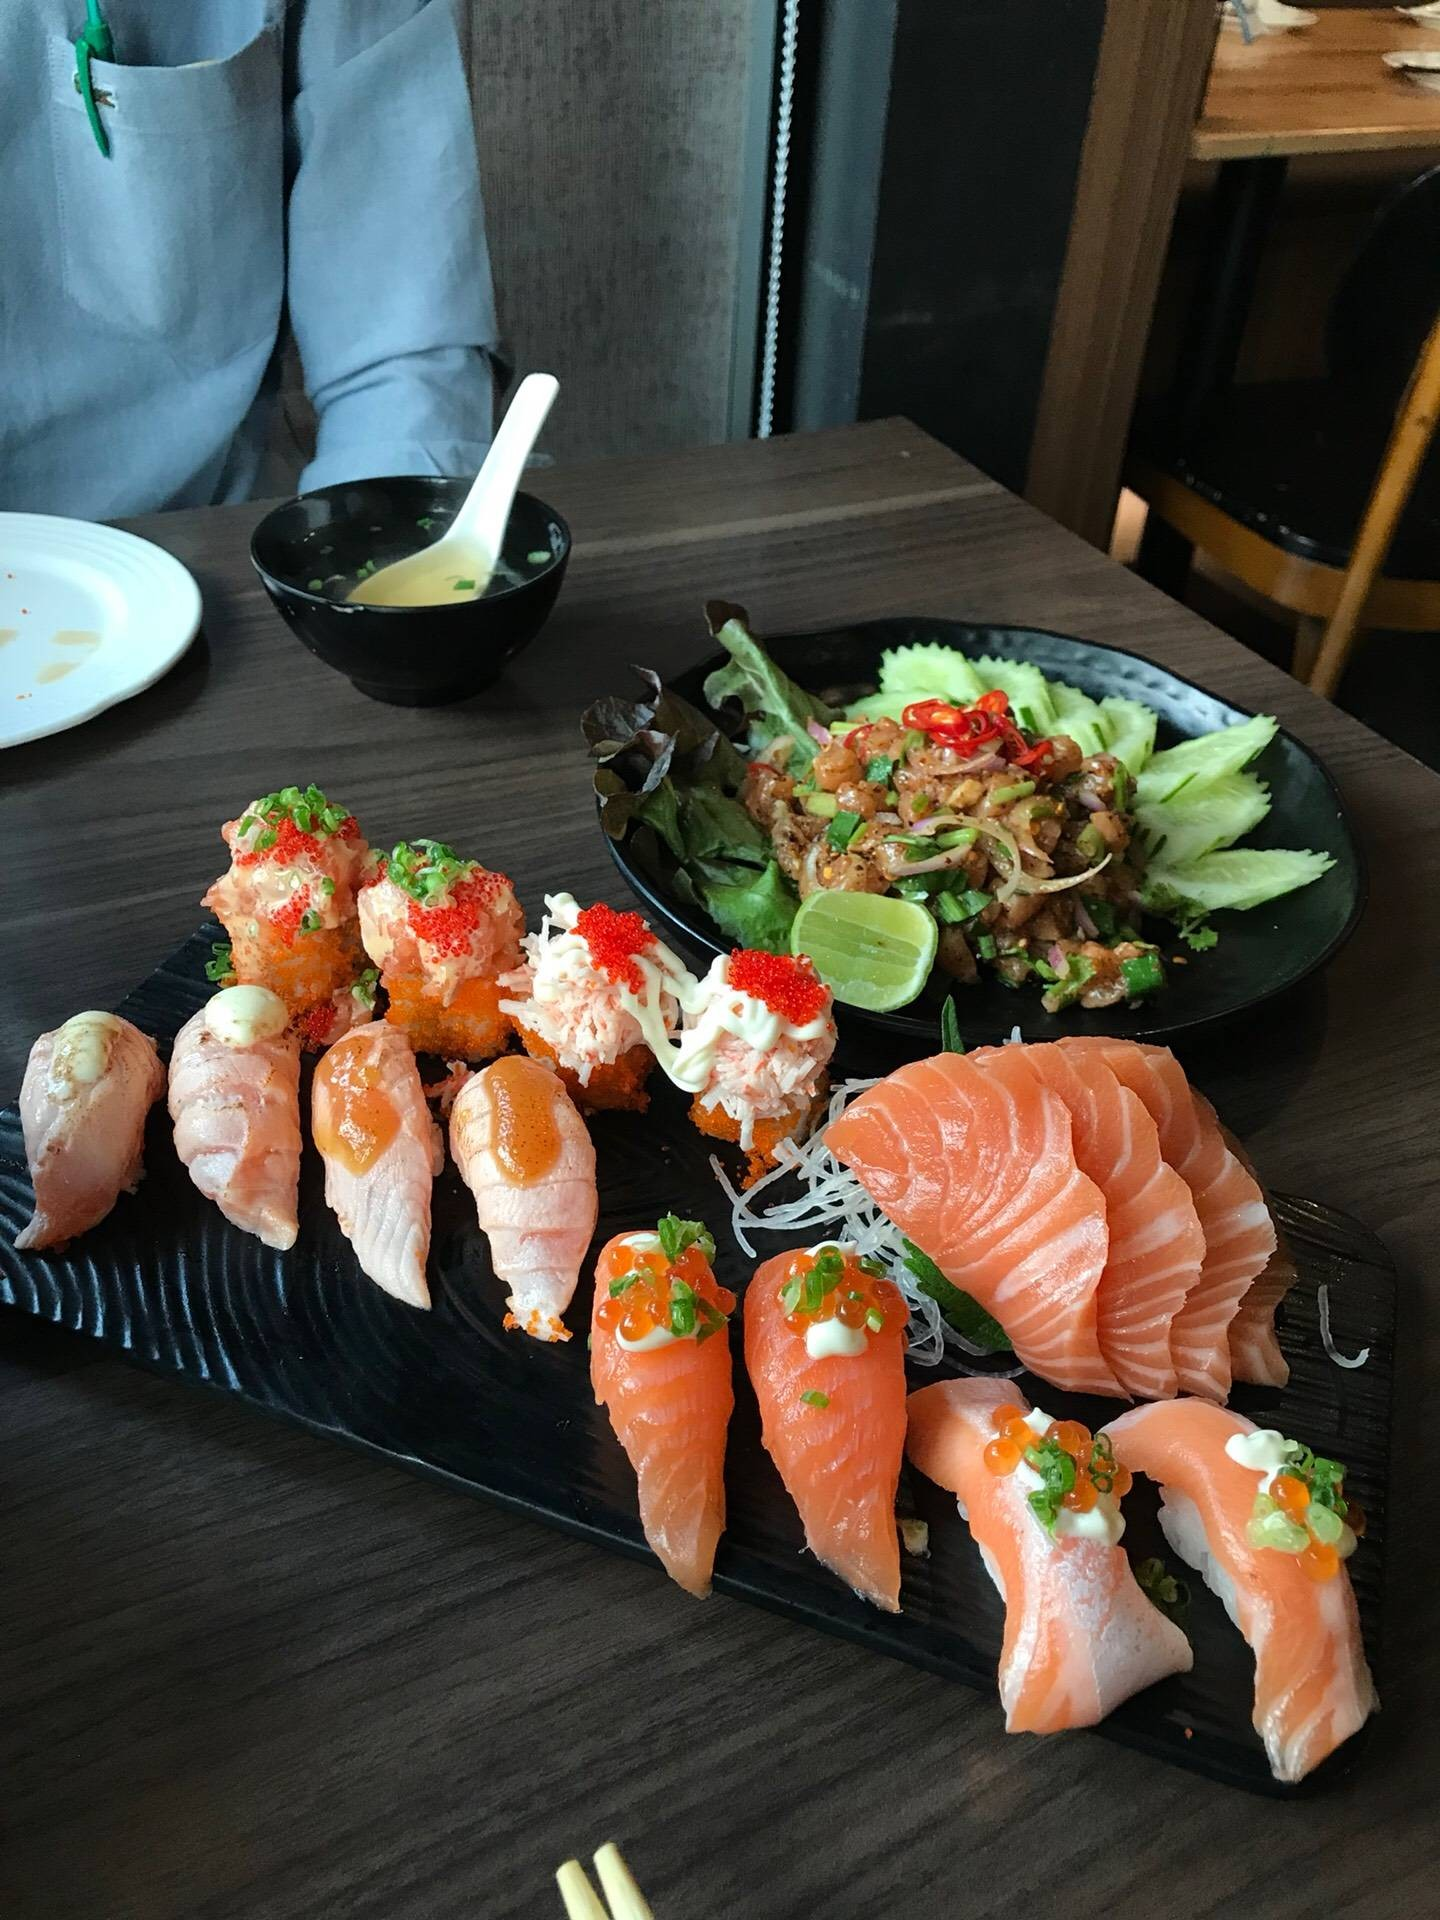 Hiso Sushi (ไฮโซะ ซูชิ) Aroi Sushi